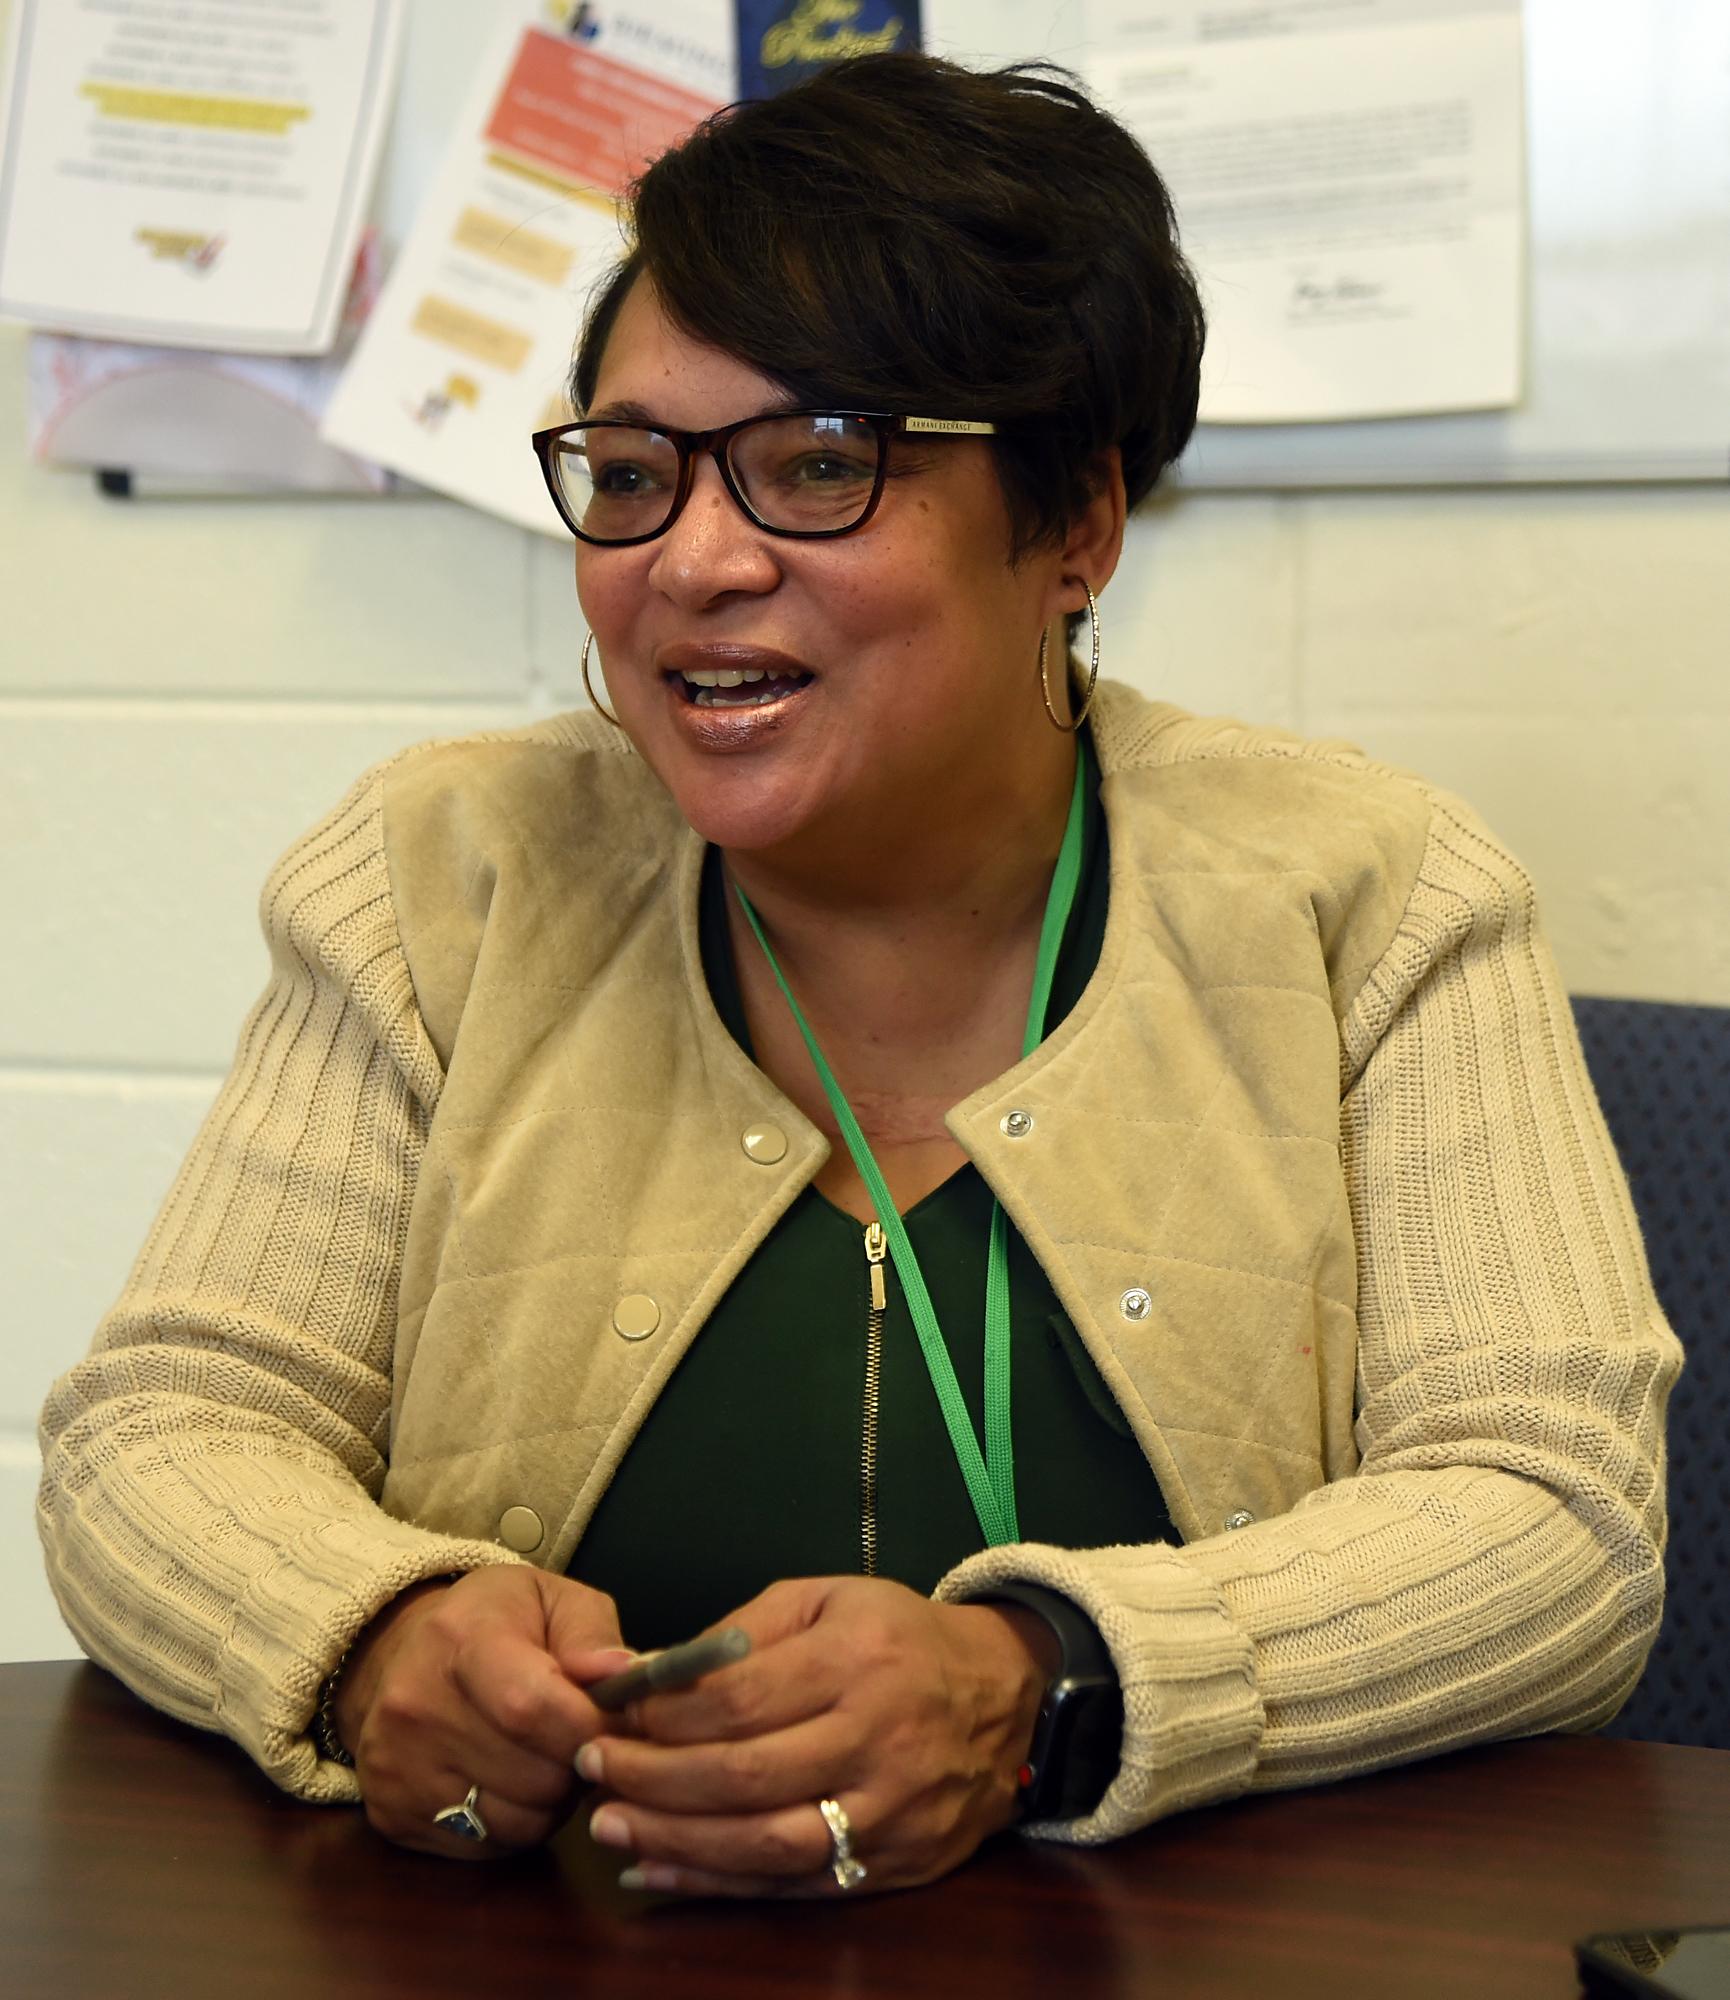 Principal Tikki Hines Brought Hope and Aura of Success to Barrett Elementary